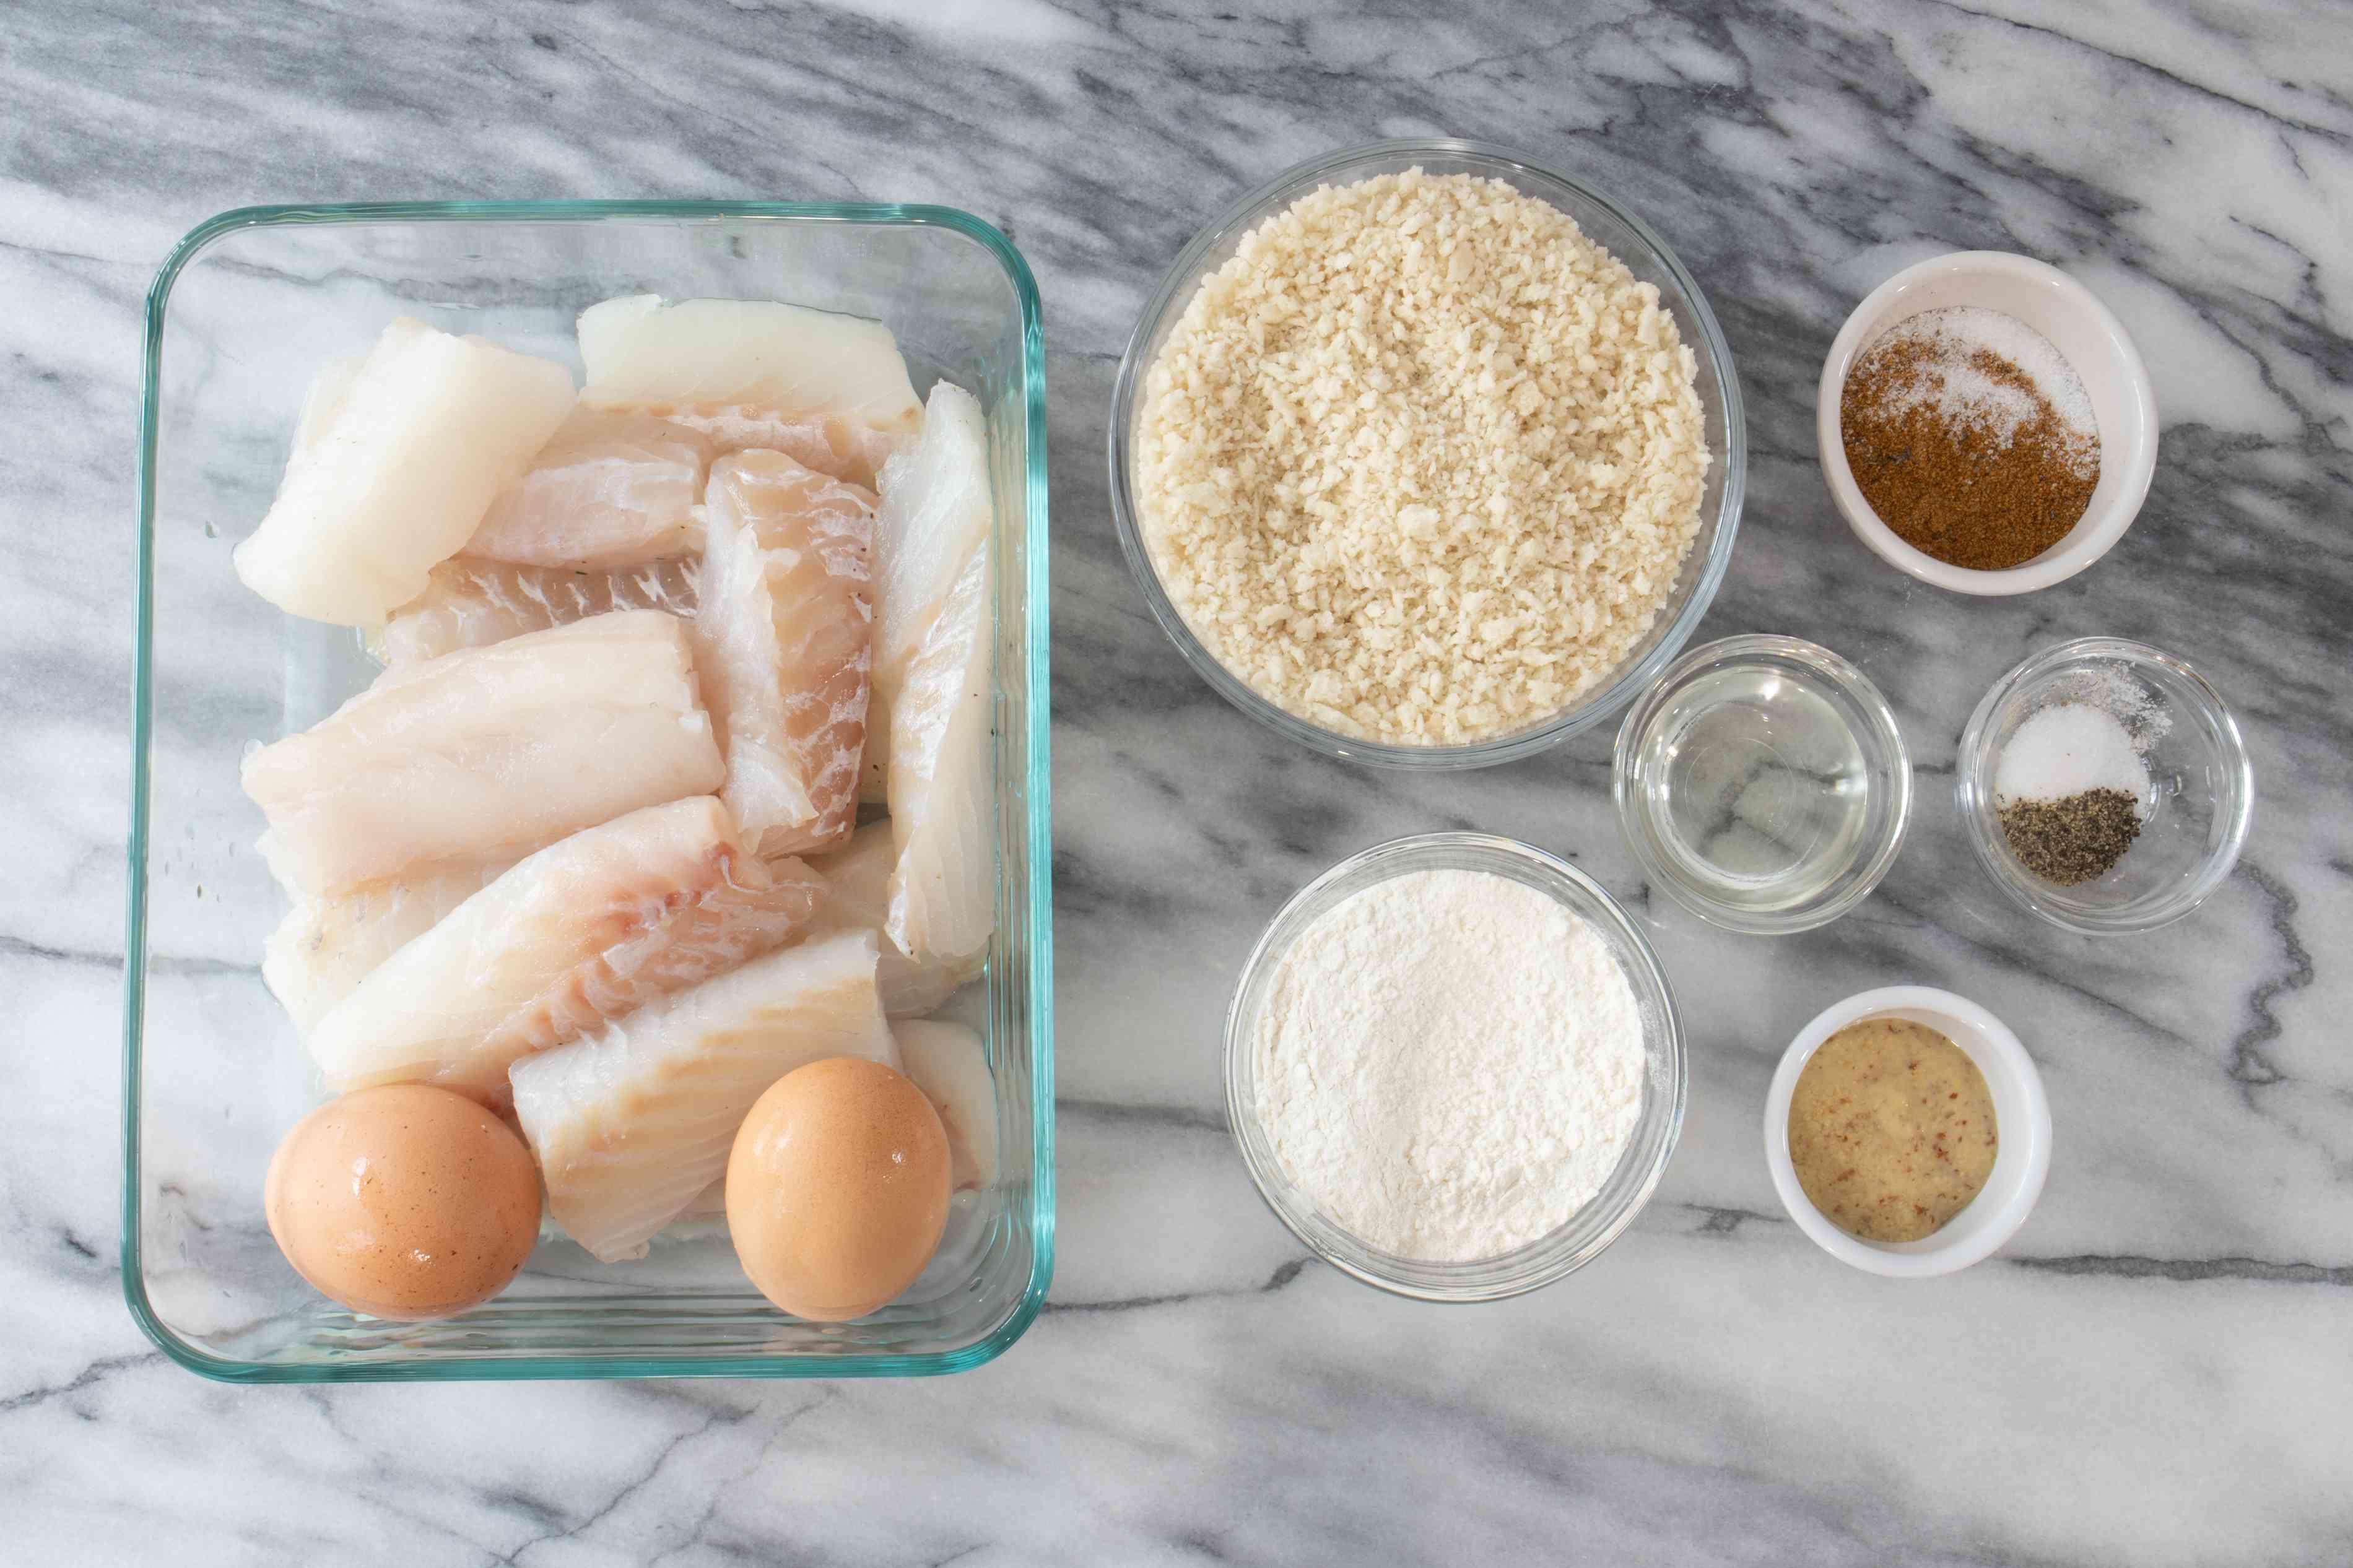 ingredients for air fryer fish sticks